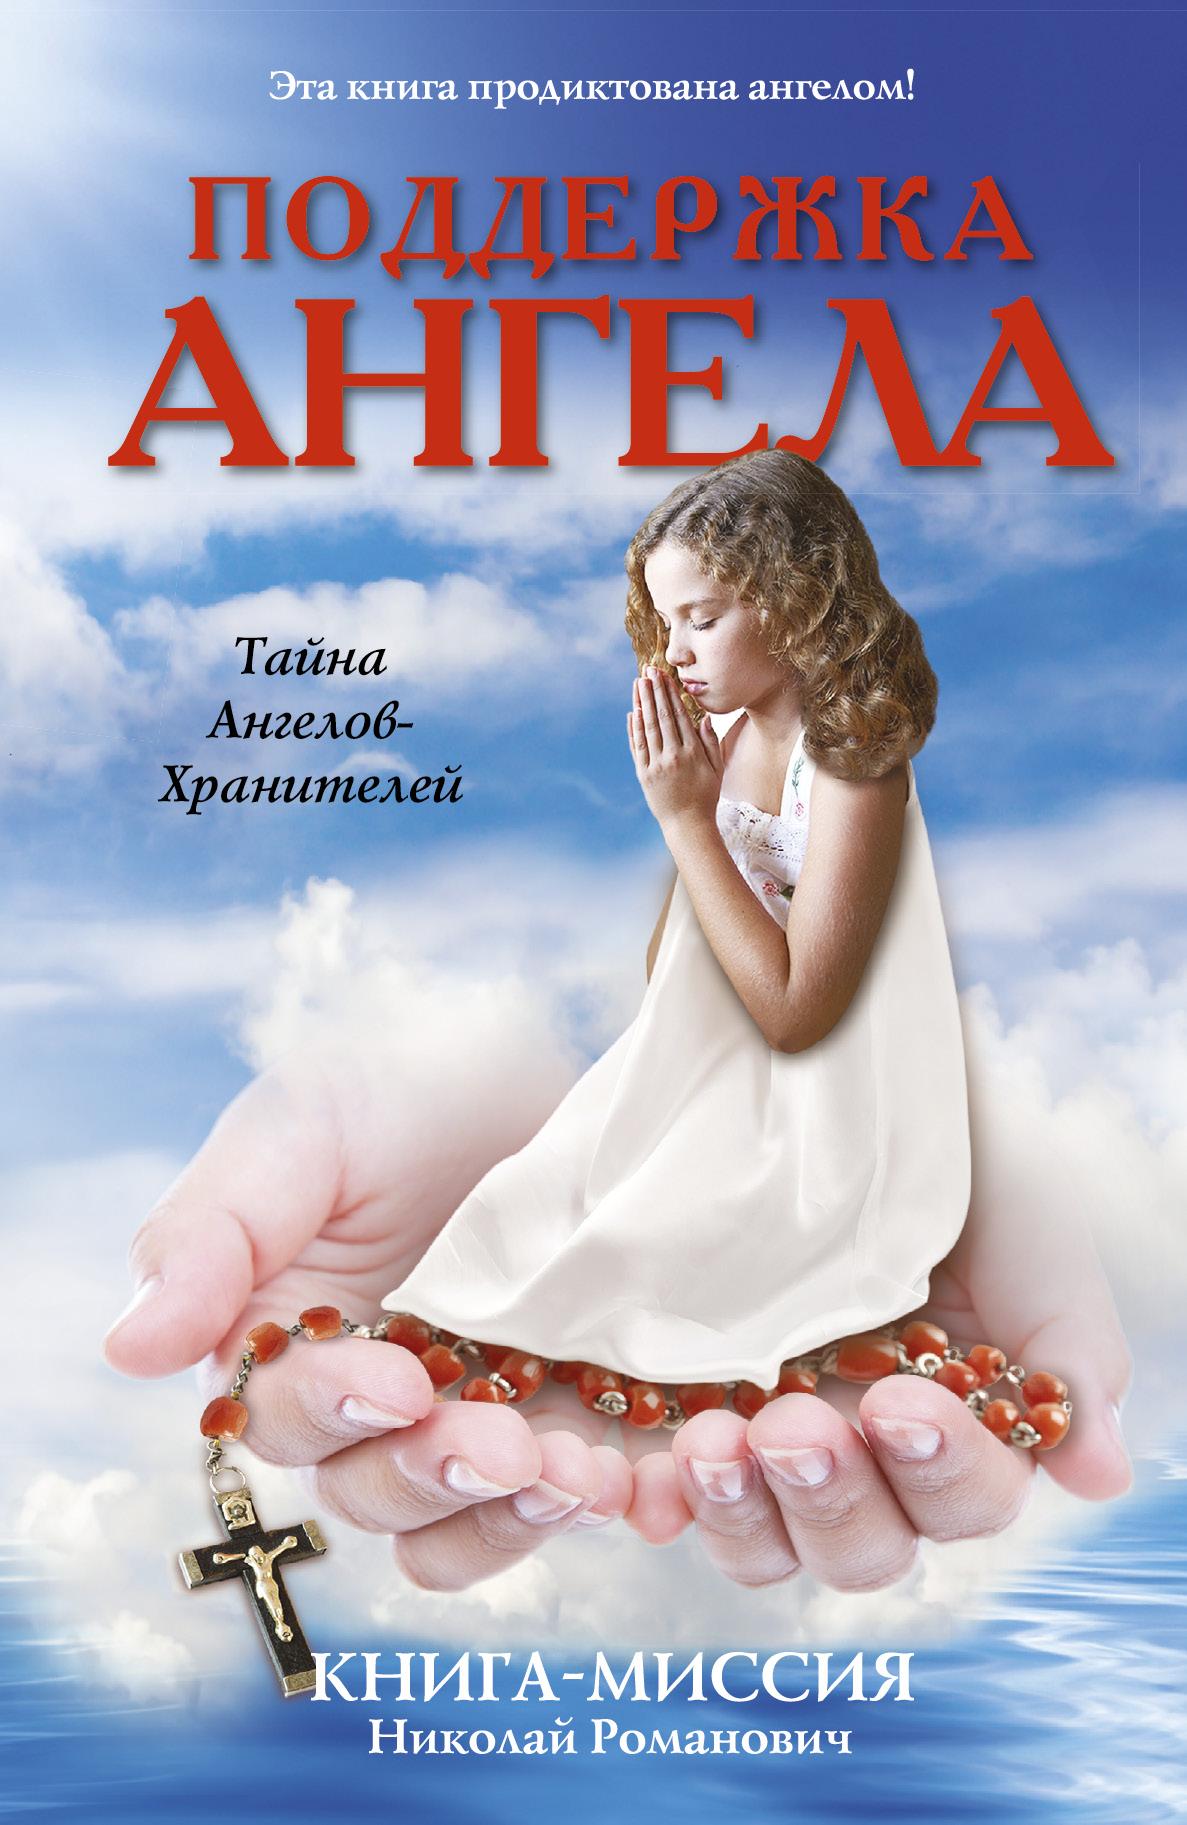 Поддержка ангела. Книга-миссия